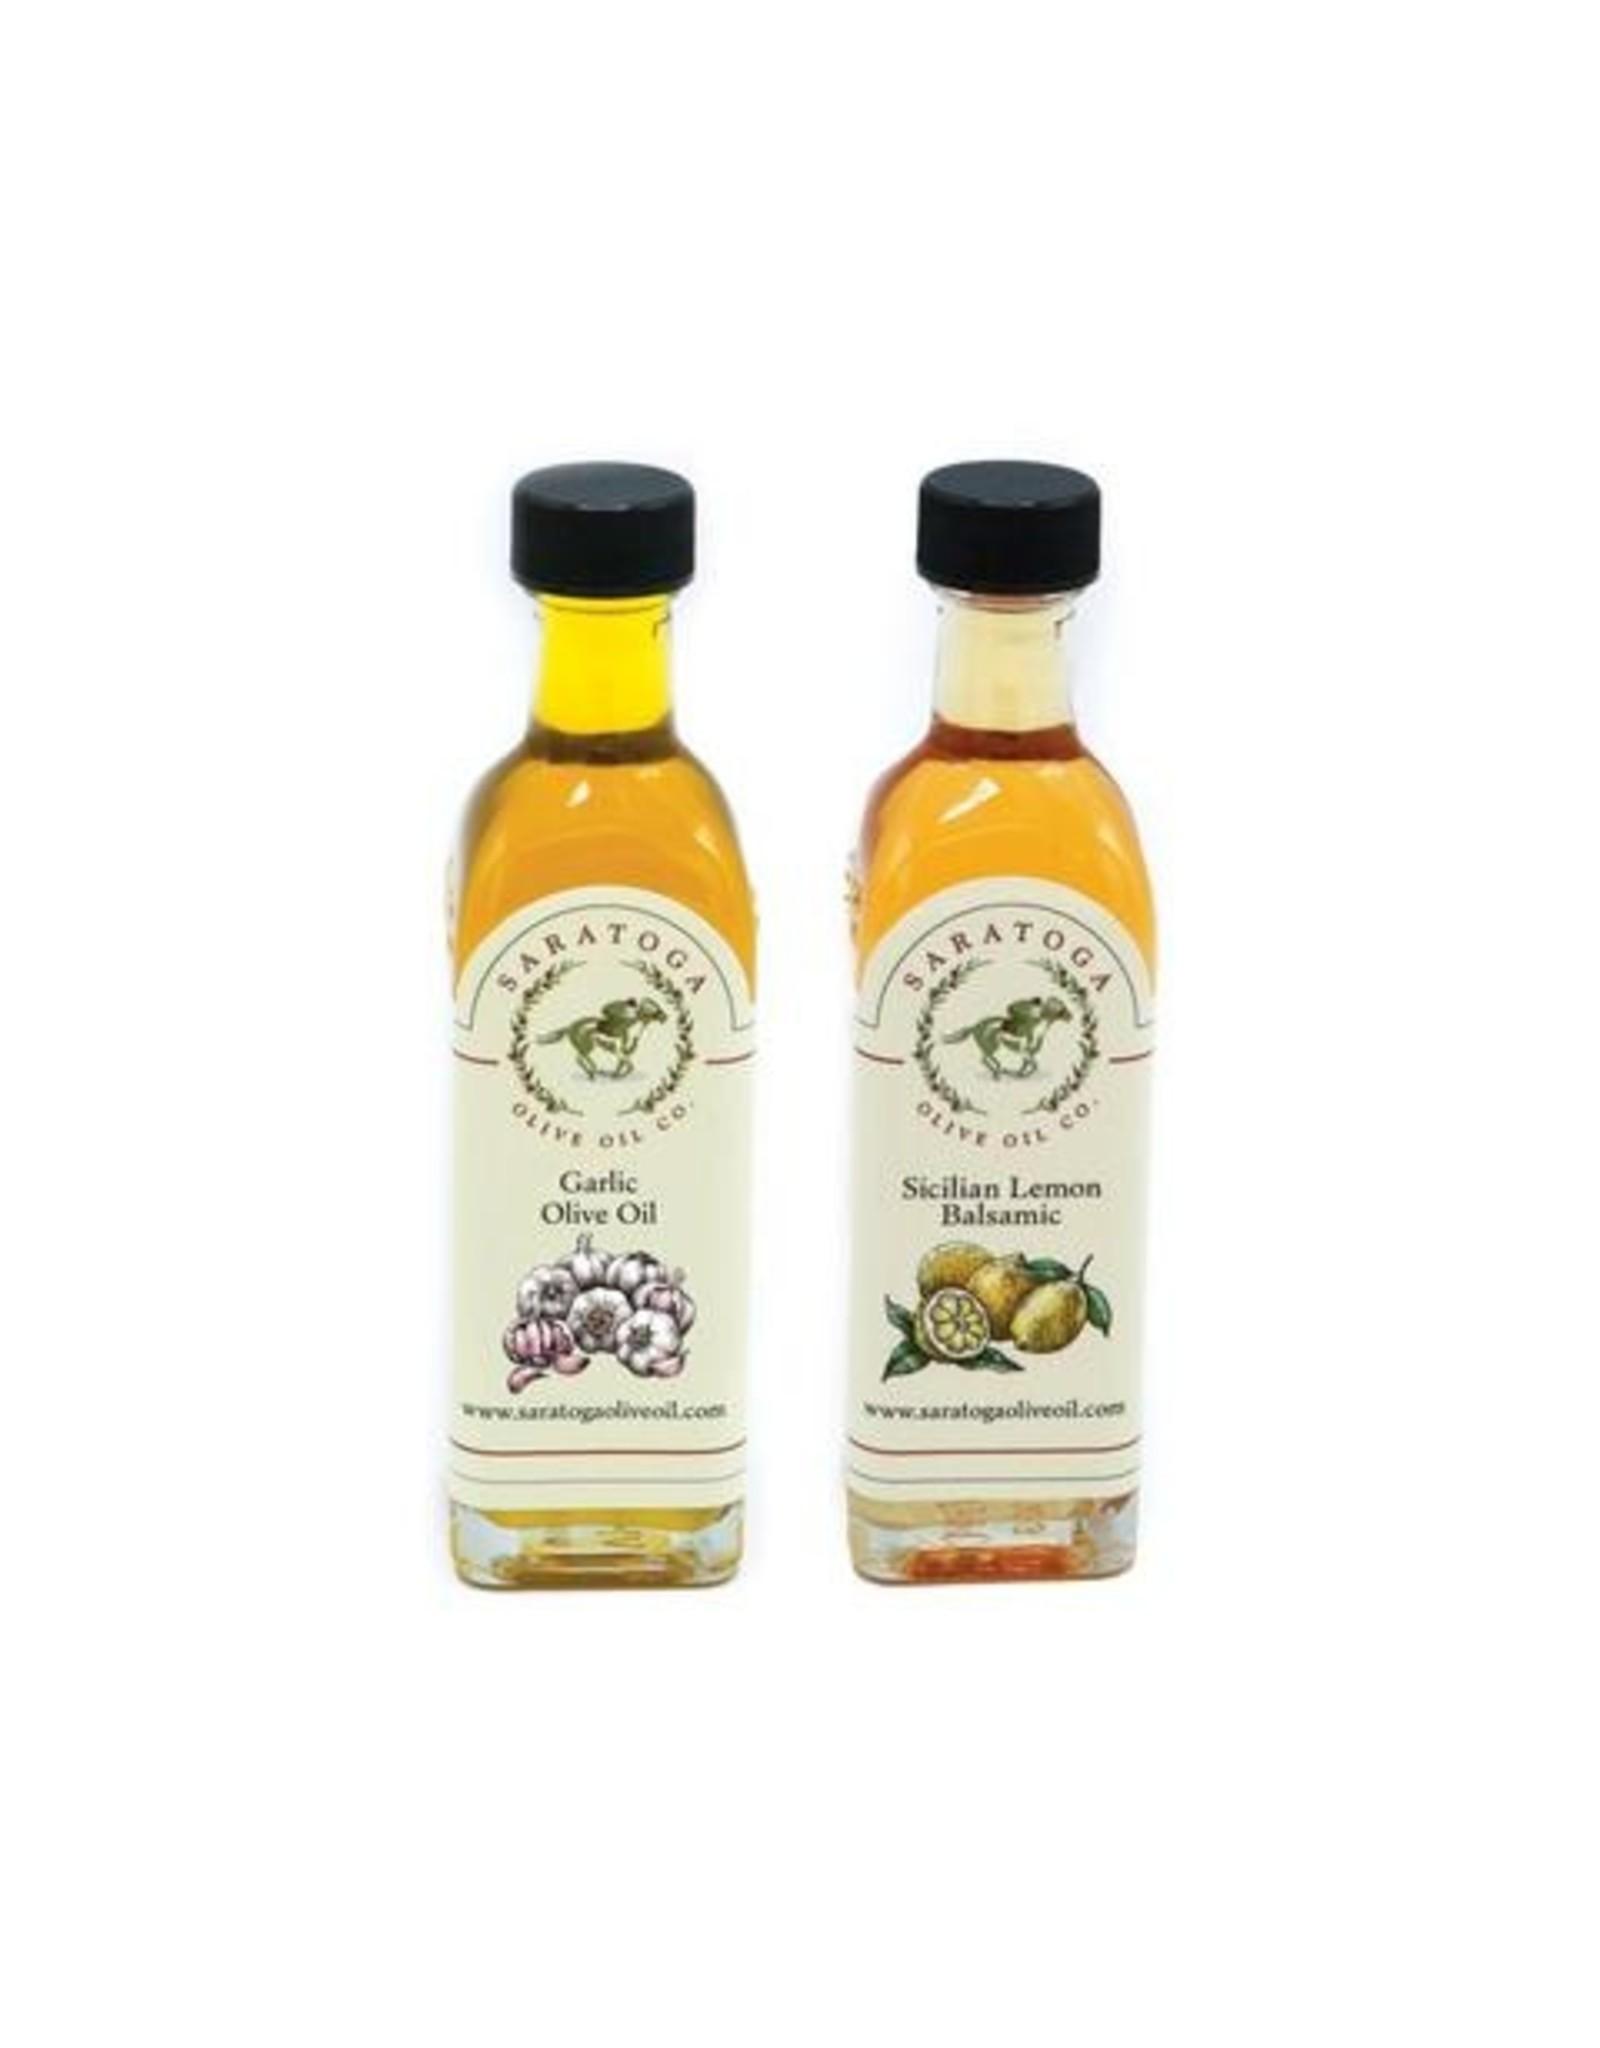 Saratoga Olive Oil Company Garlic Olive Oil